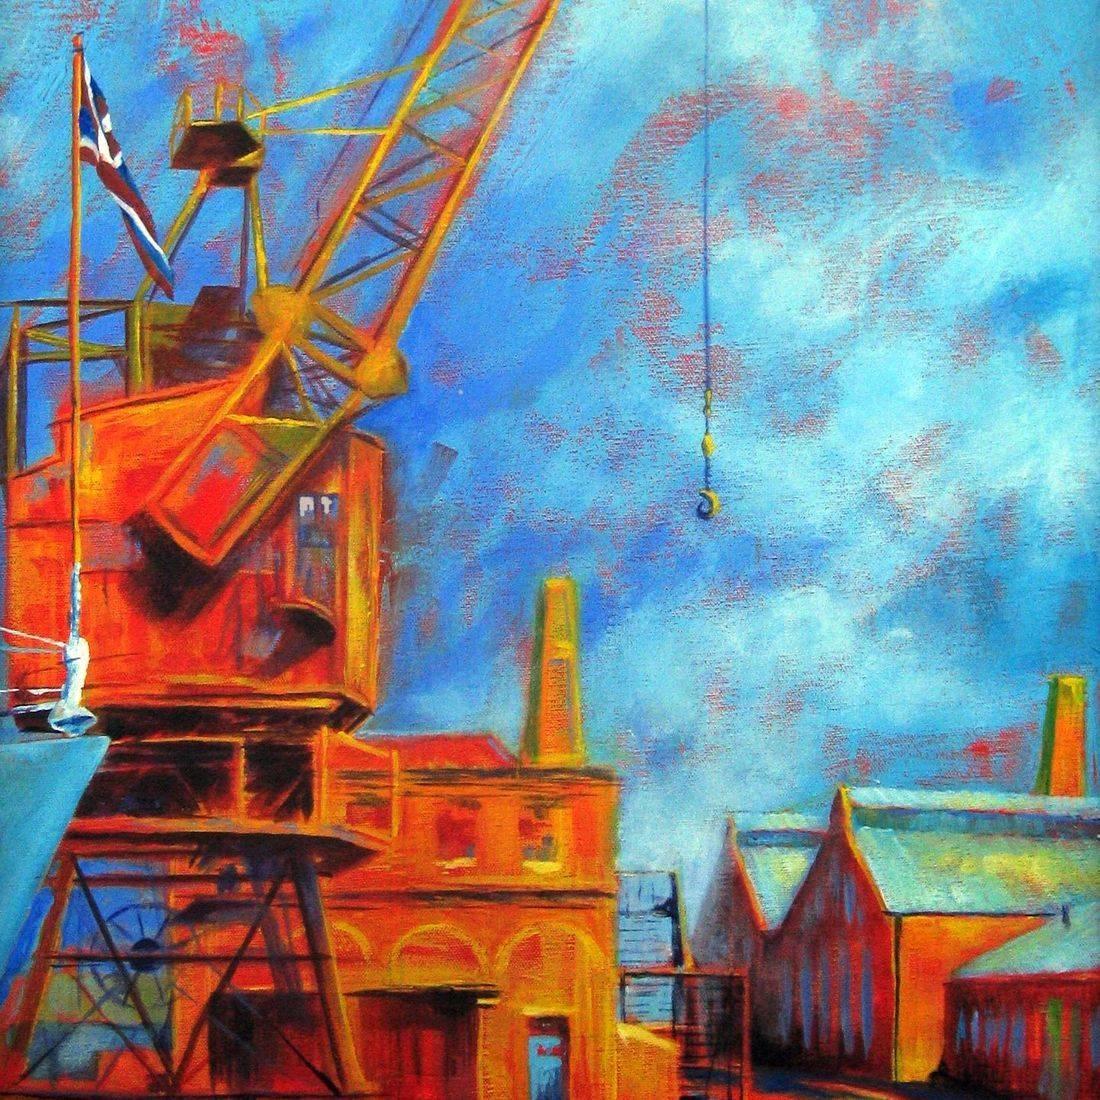 Acrylic painting dockyard Chatham by Sandra Louisa